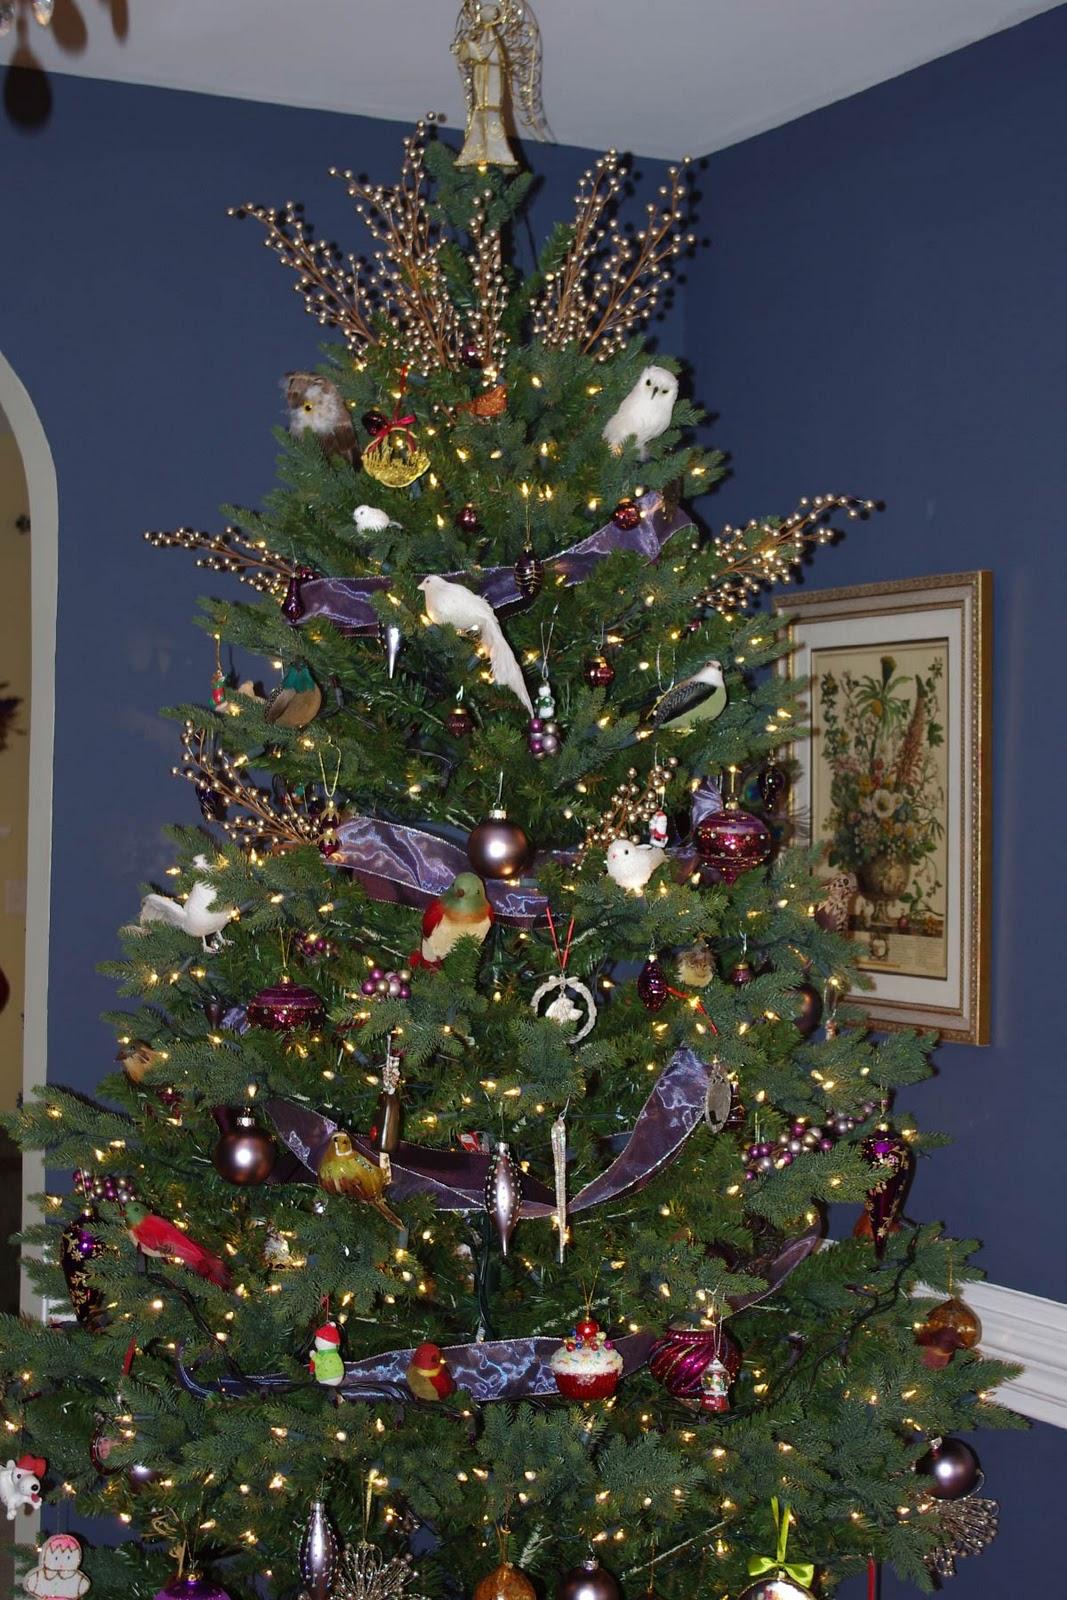 Studio B (UberArt): Twelve Days of Christmas Trees: Day 12